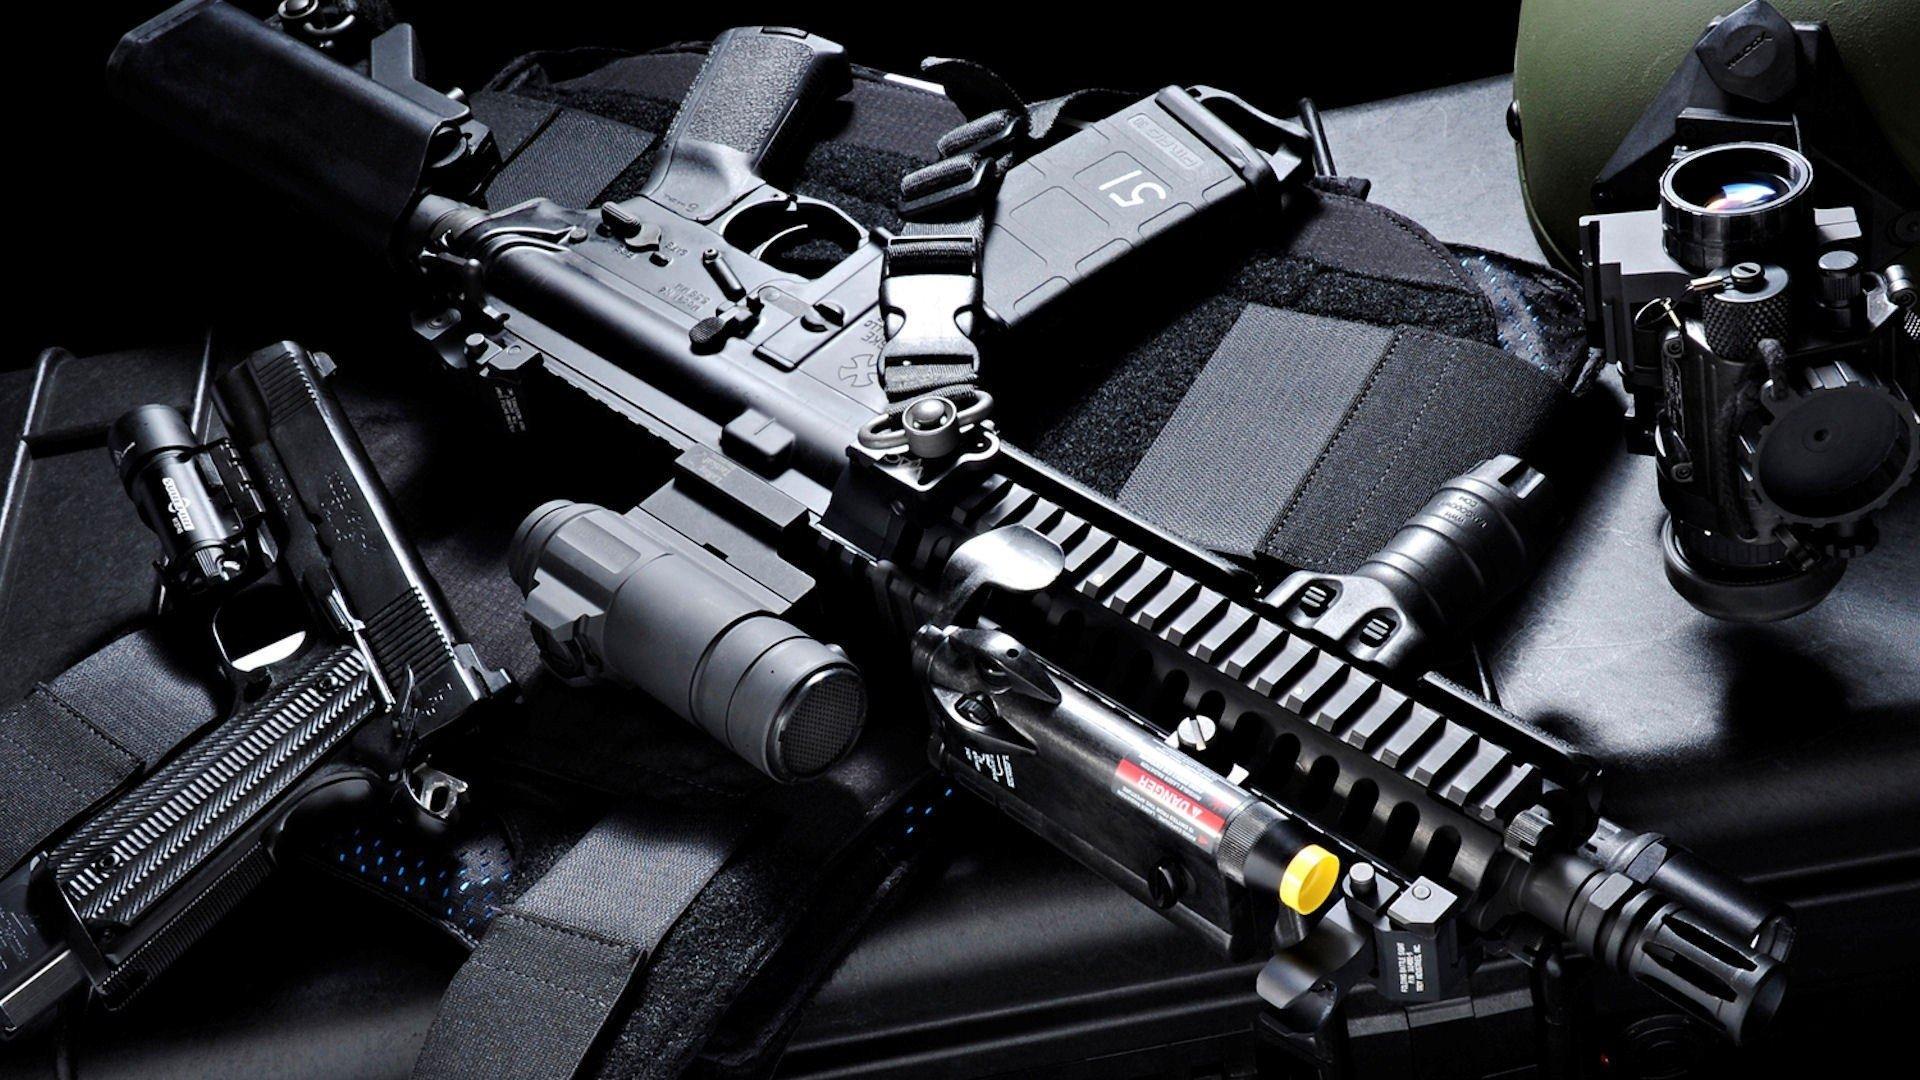 Hd wallpaper gun - Hd Wallpaper Background Id 266439